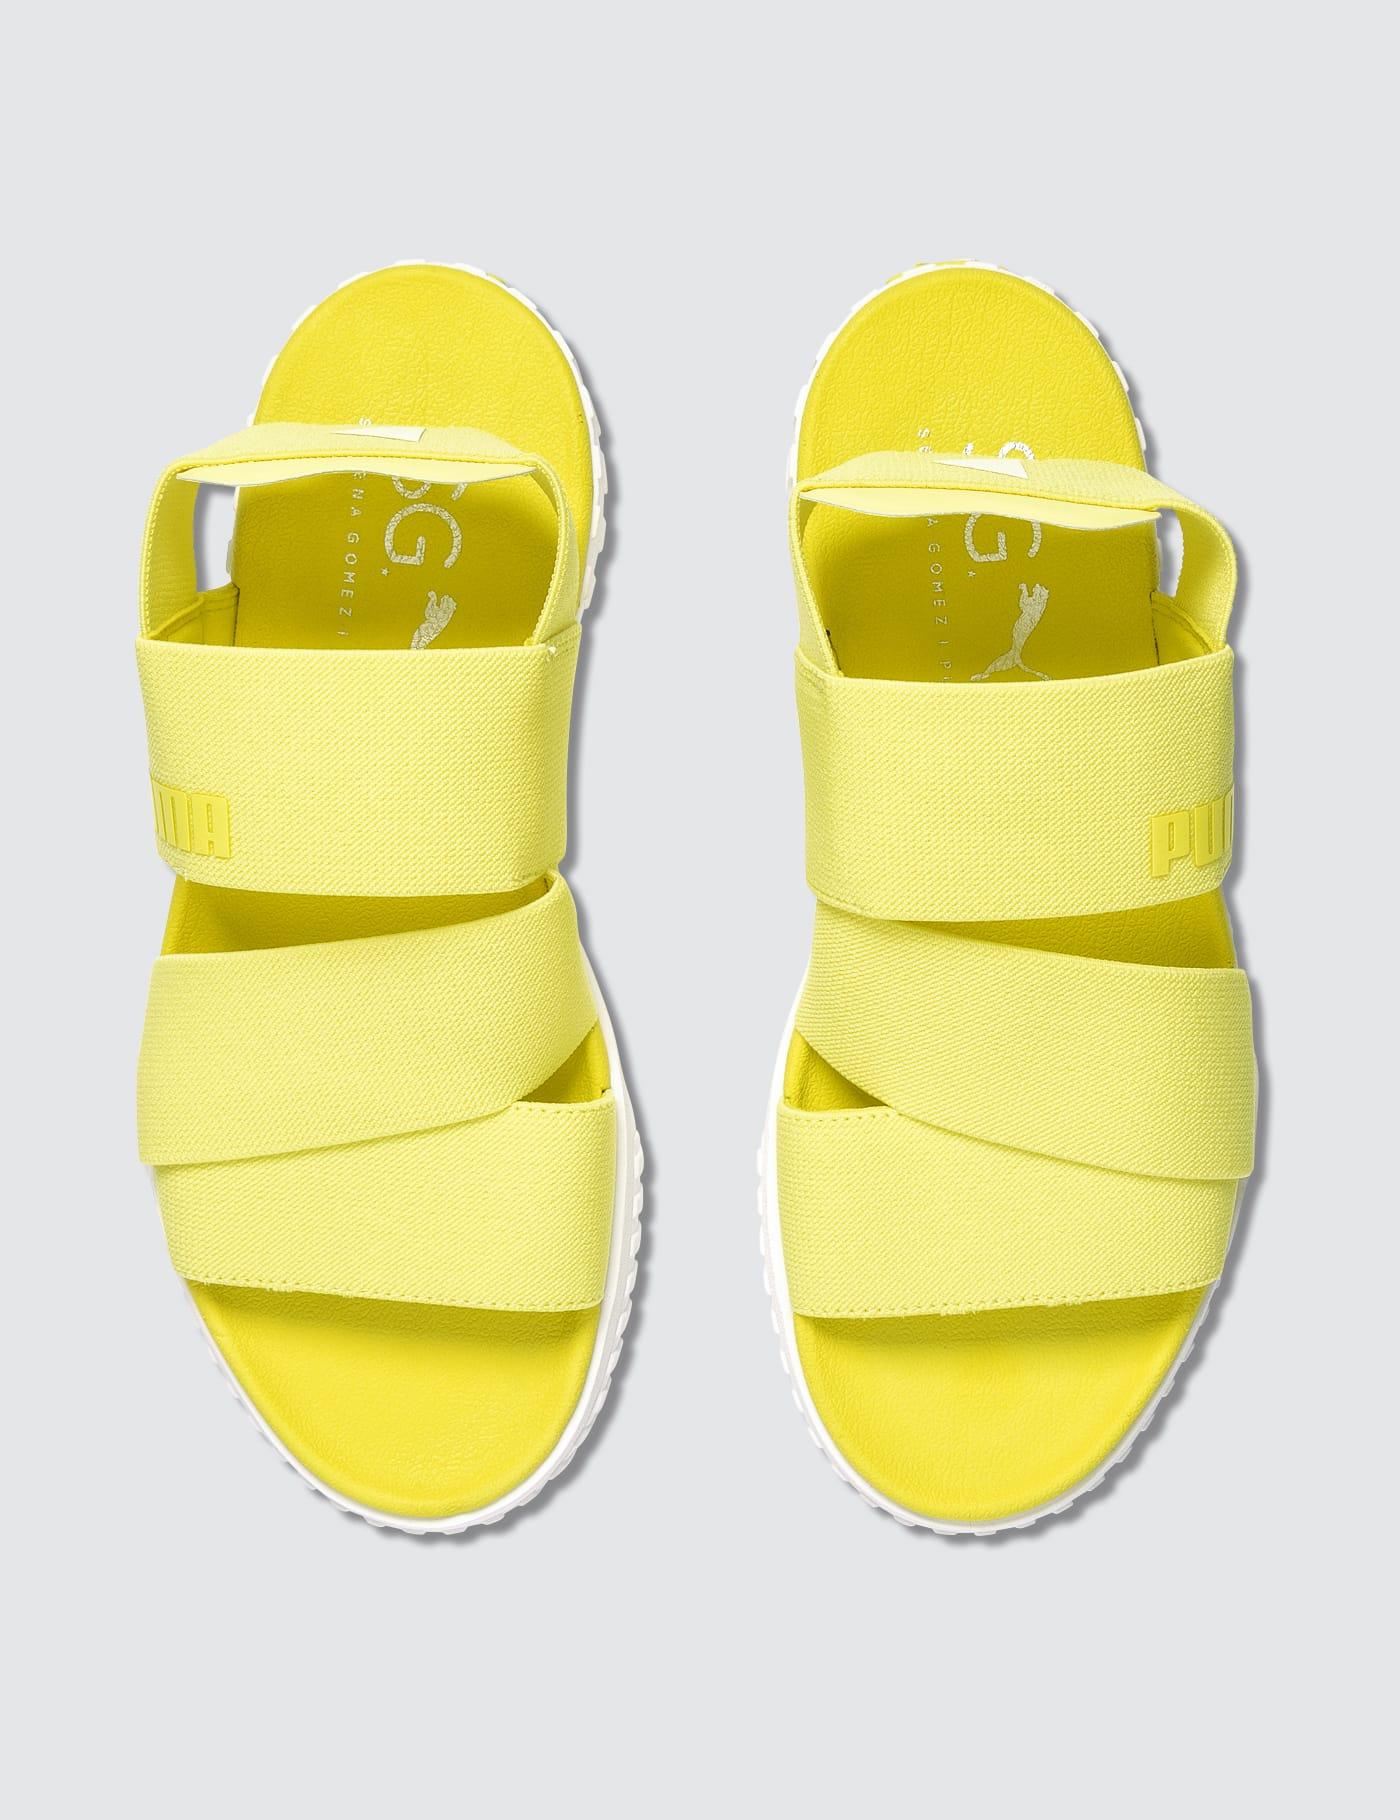 puma yellow sandals